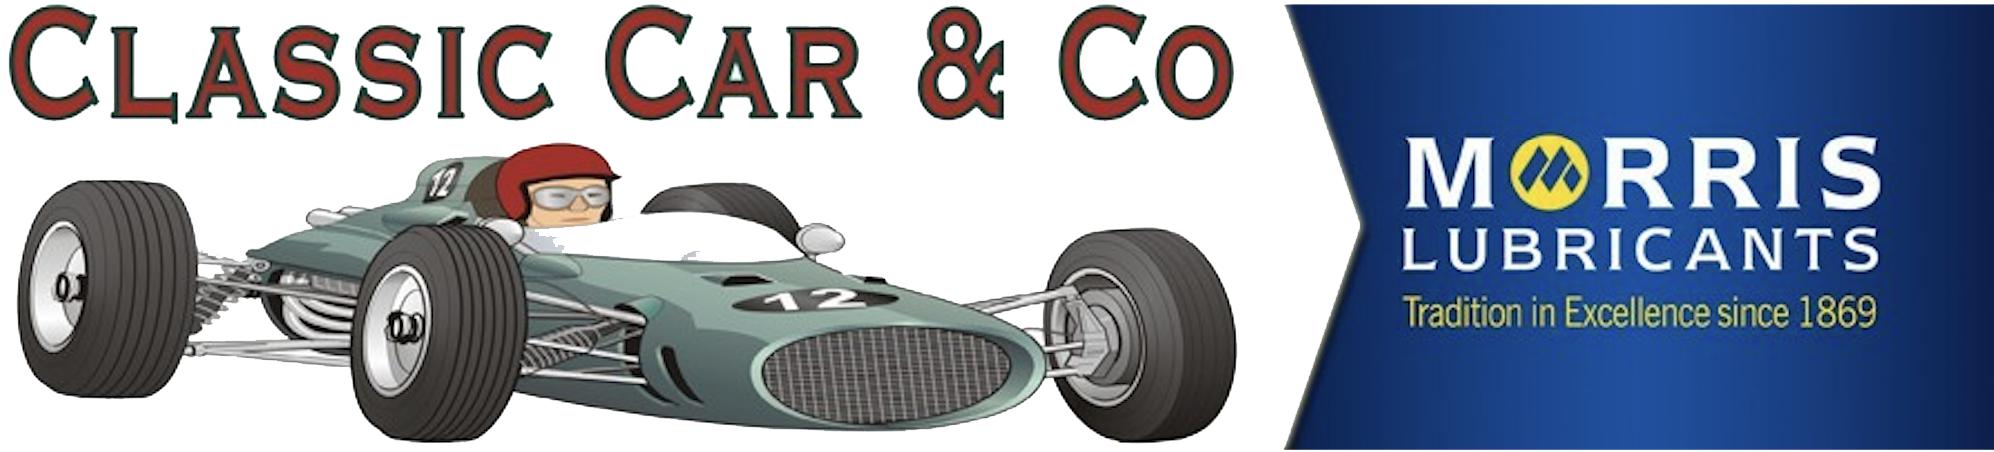 Classic Cars and Co - Huiles moteur Morris Lubricants - Autos - Motos